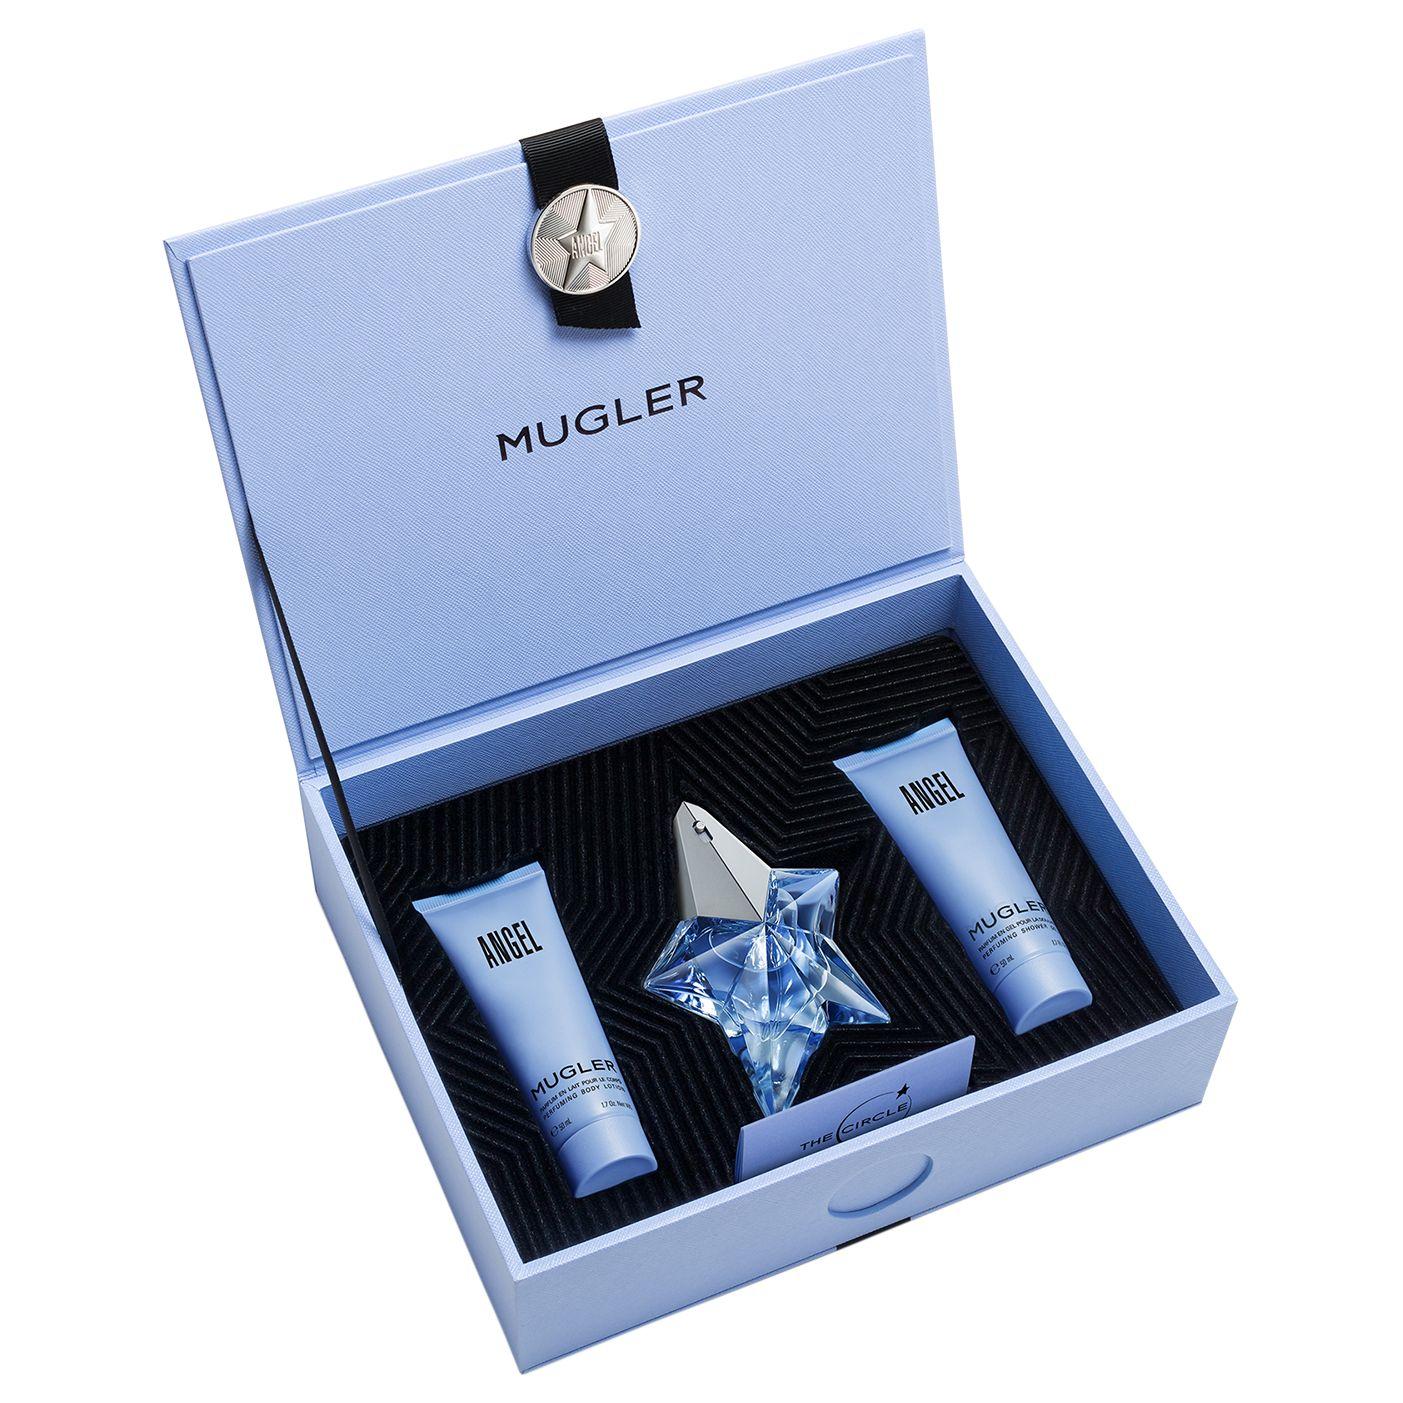 Mugler Mugler Angel 25ml Eau de Parfum Fragrance Gift Set